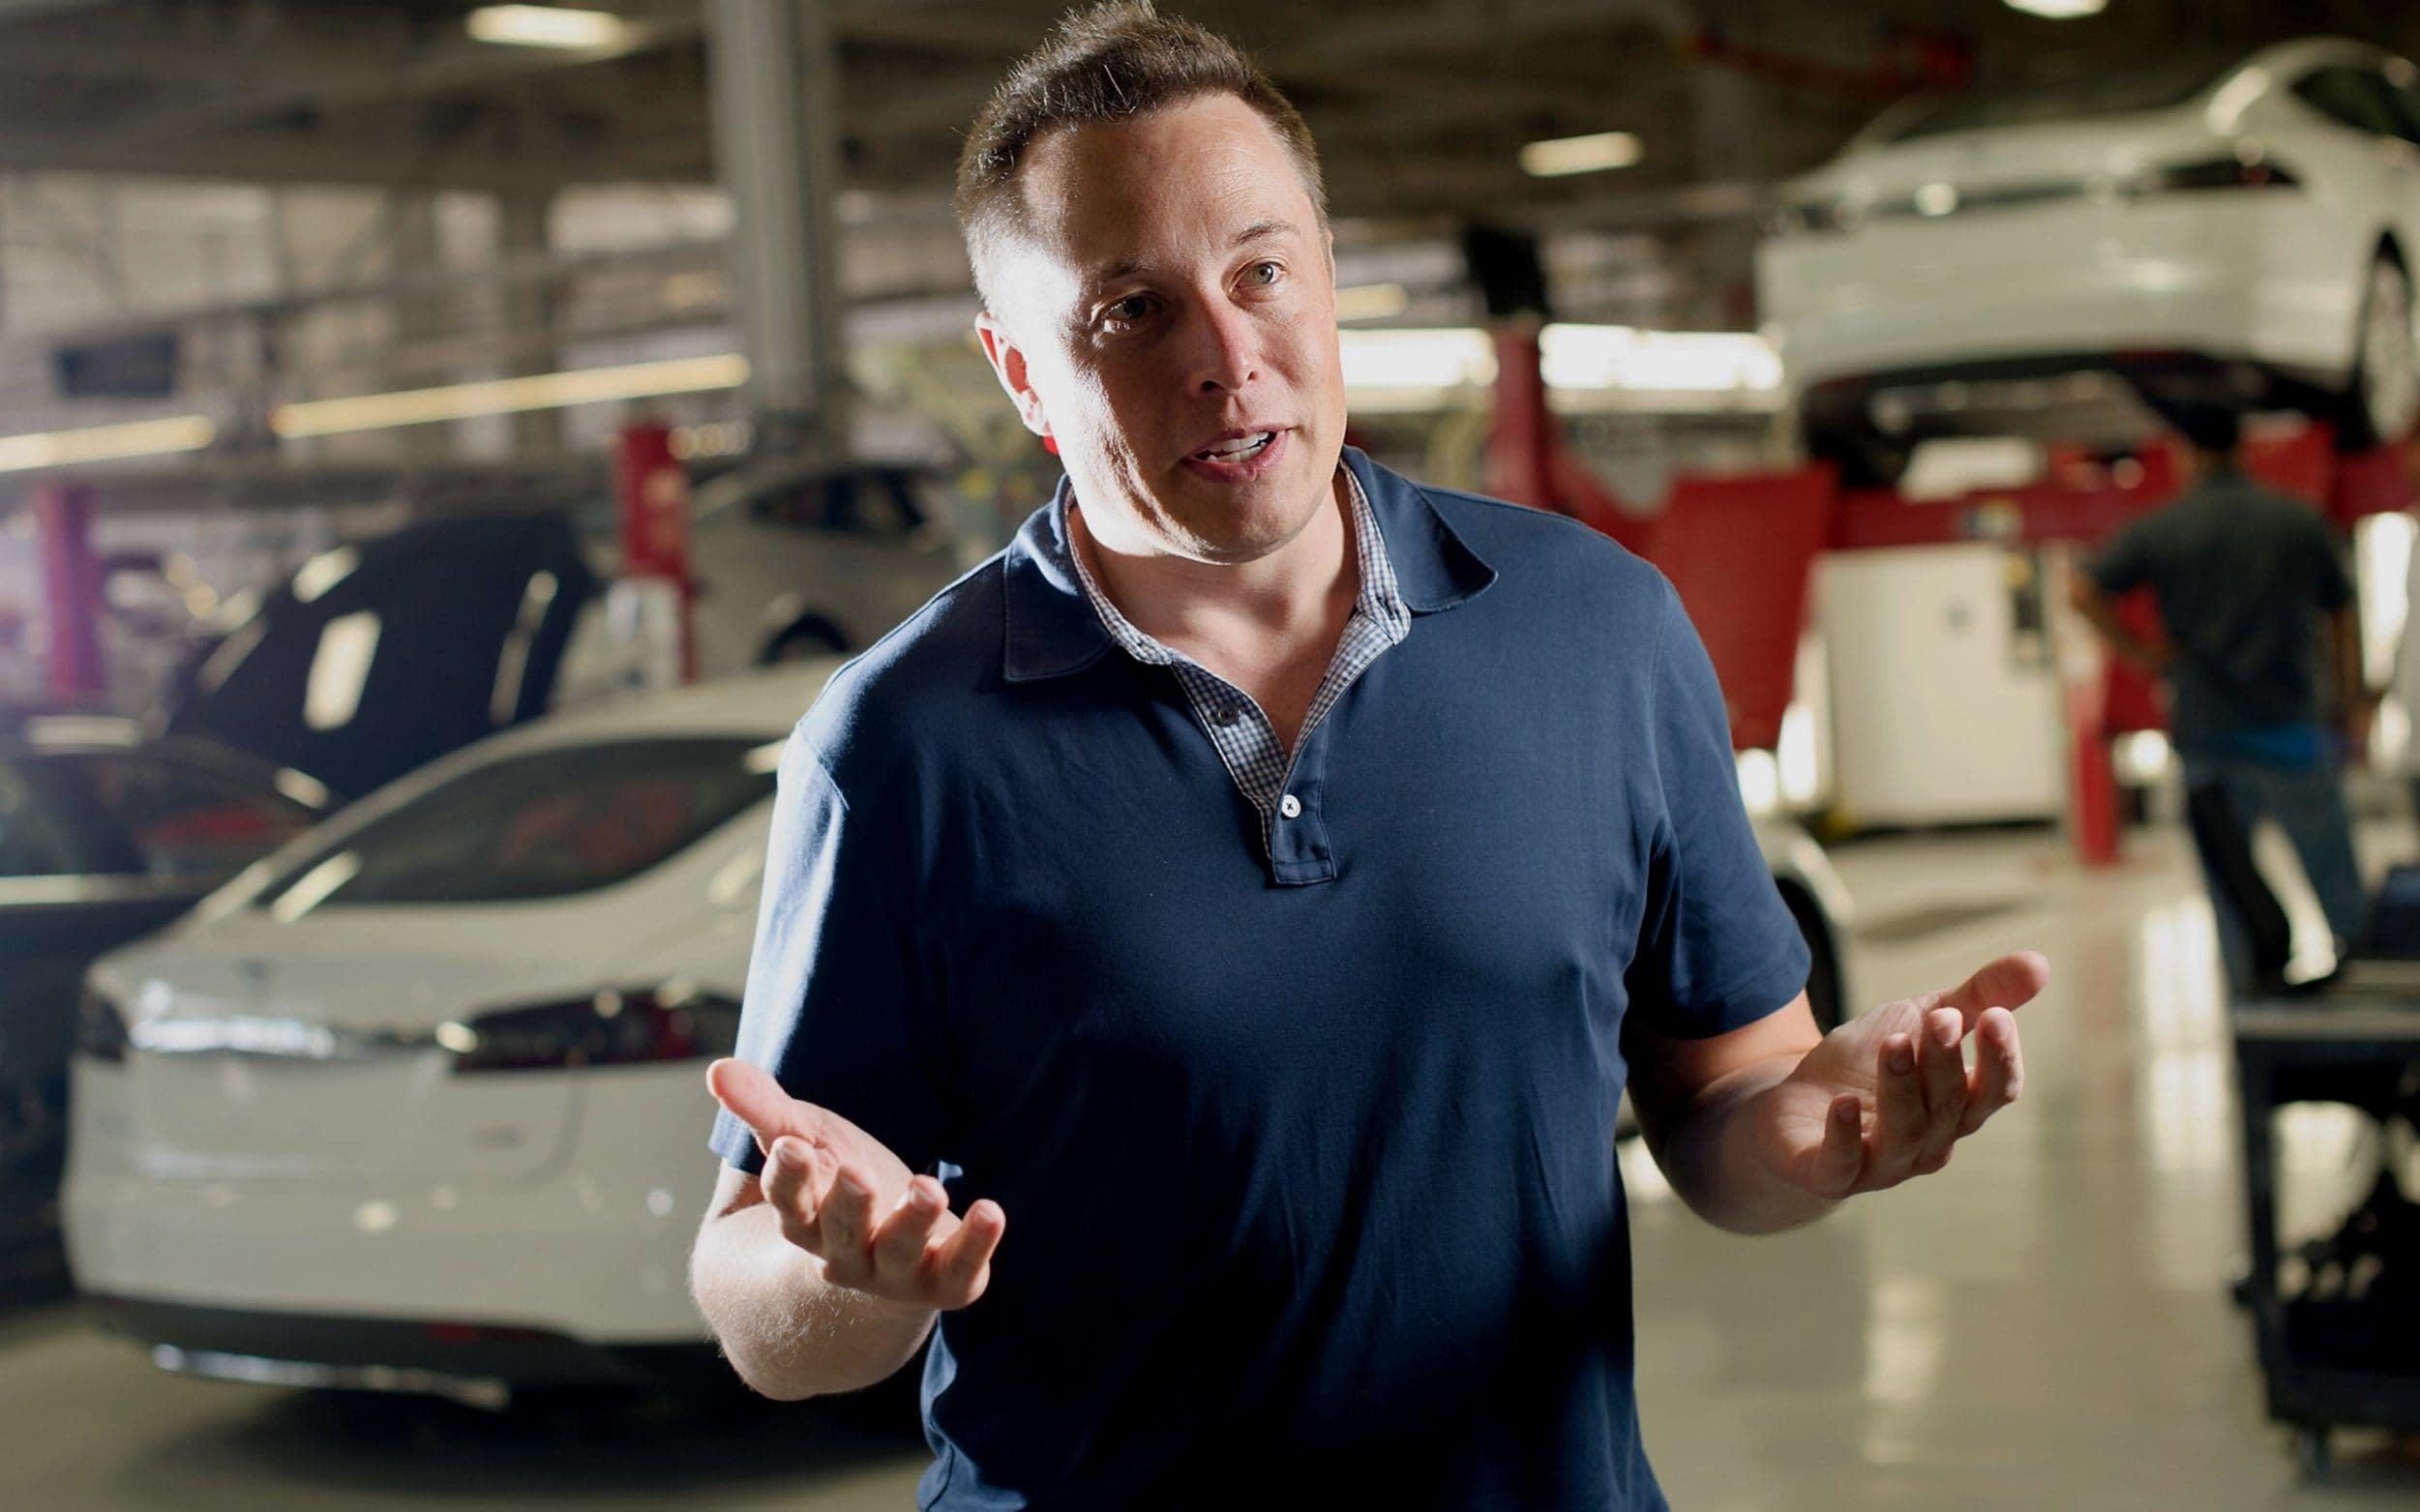 Elon Musk shoots back at US regulators, accusing them of 'retaliation and censorship'